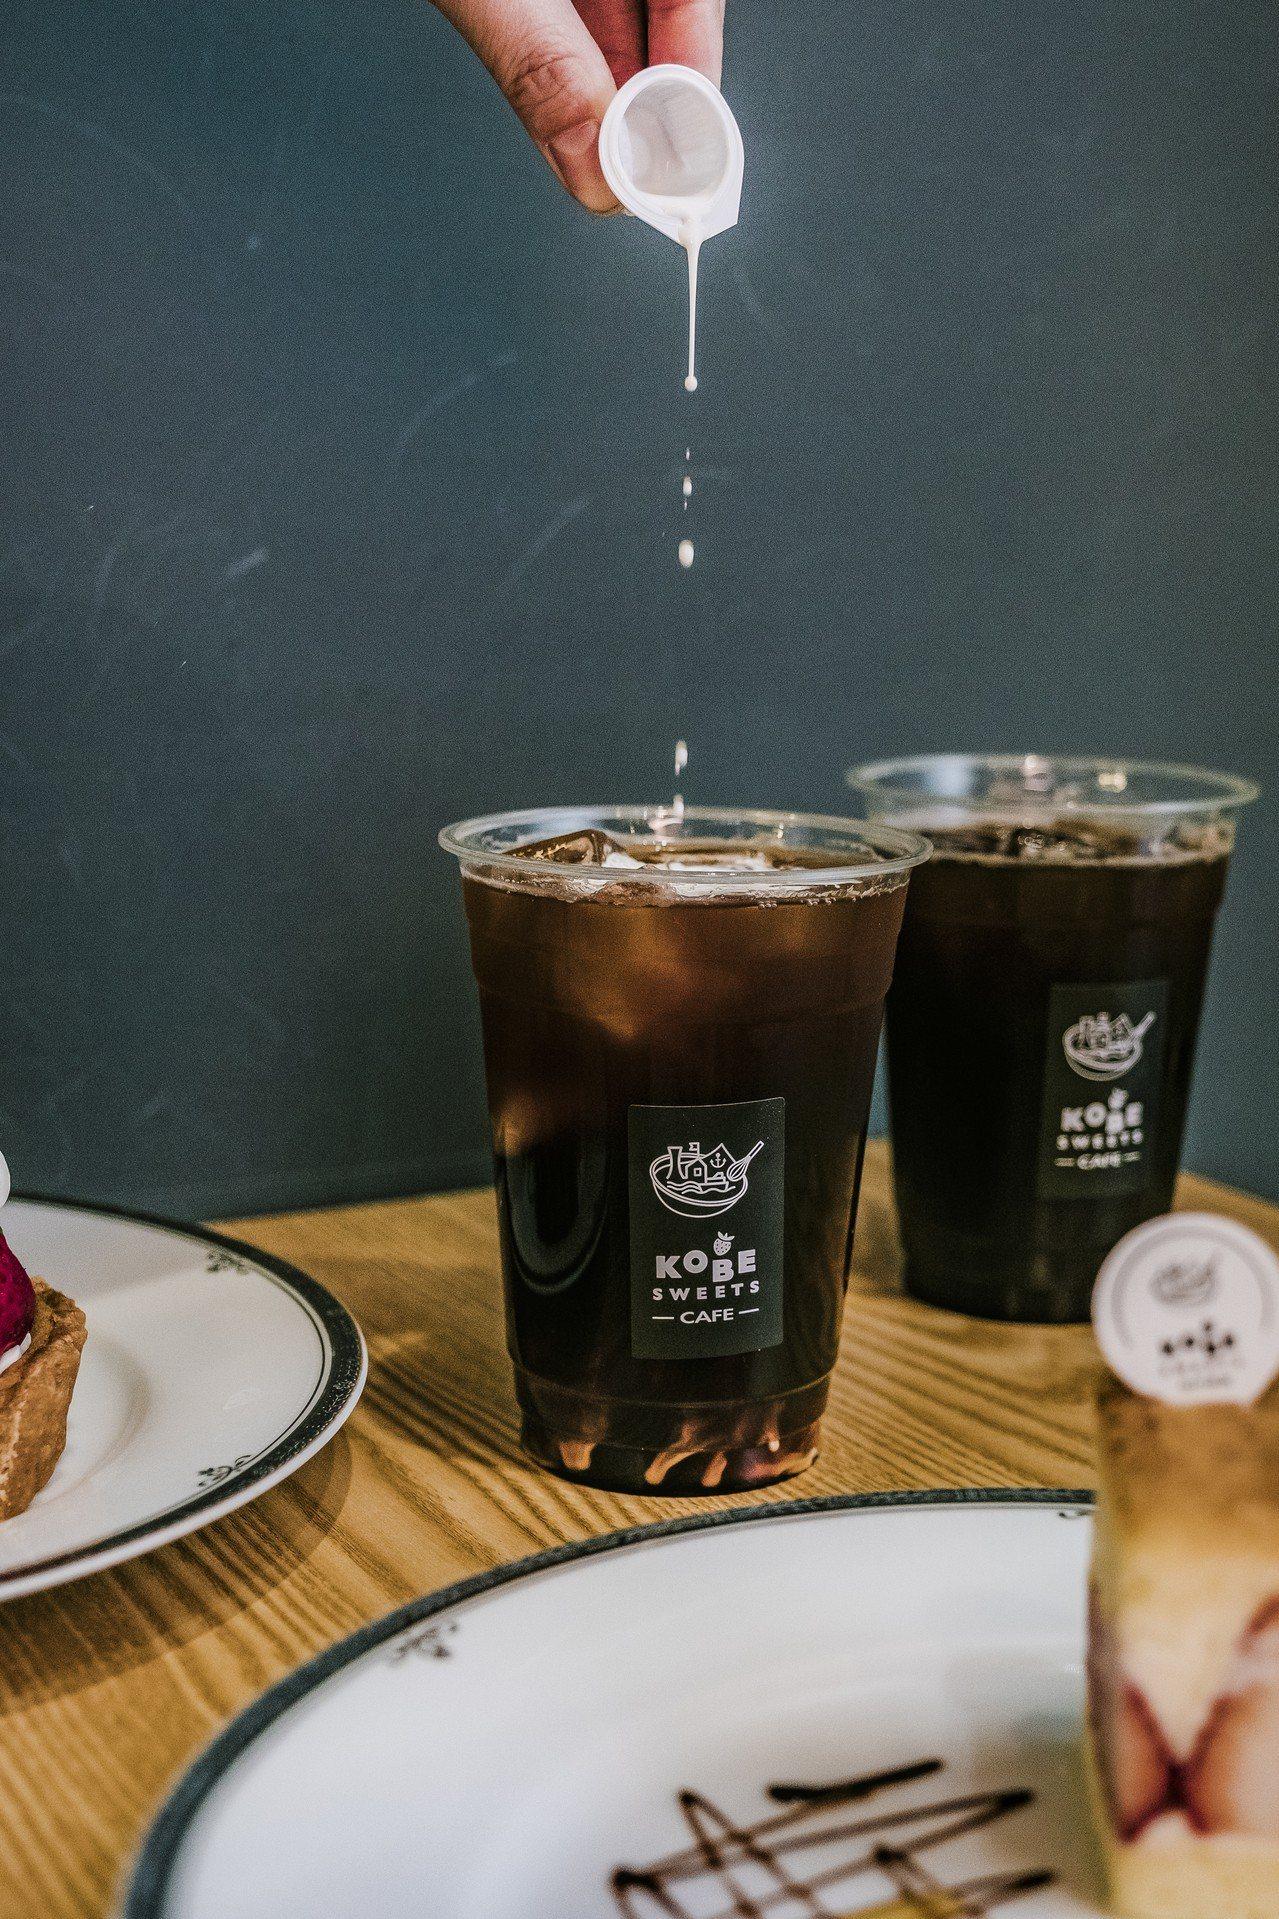 KOBE SWEETS CAFE。攝影/美味拍手